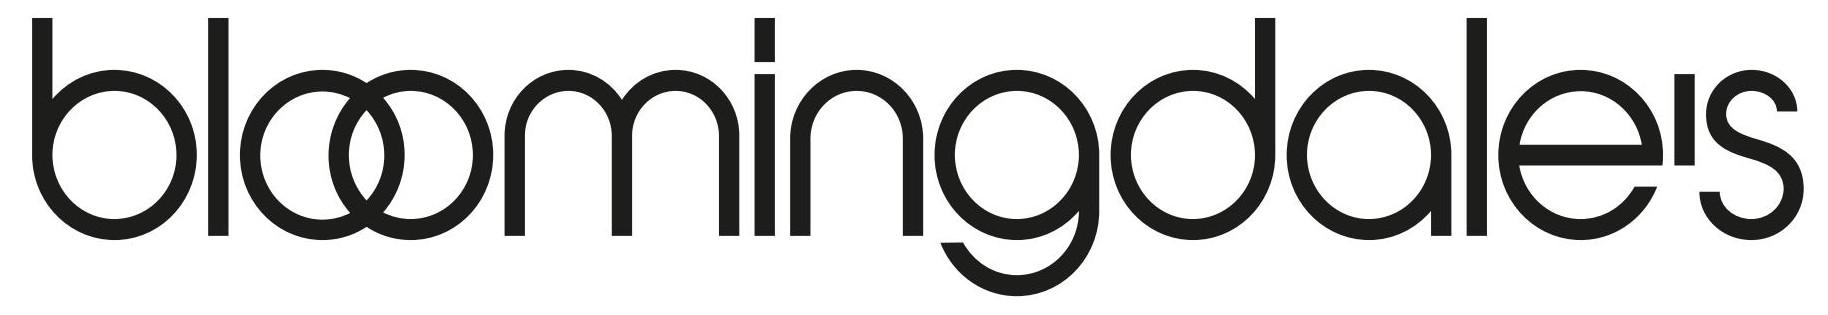 Bloomingdales Logo png